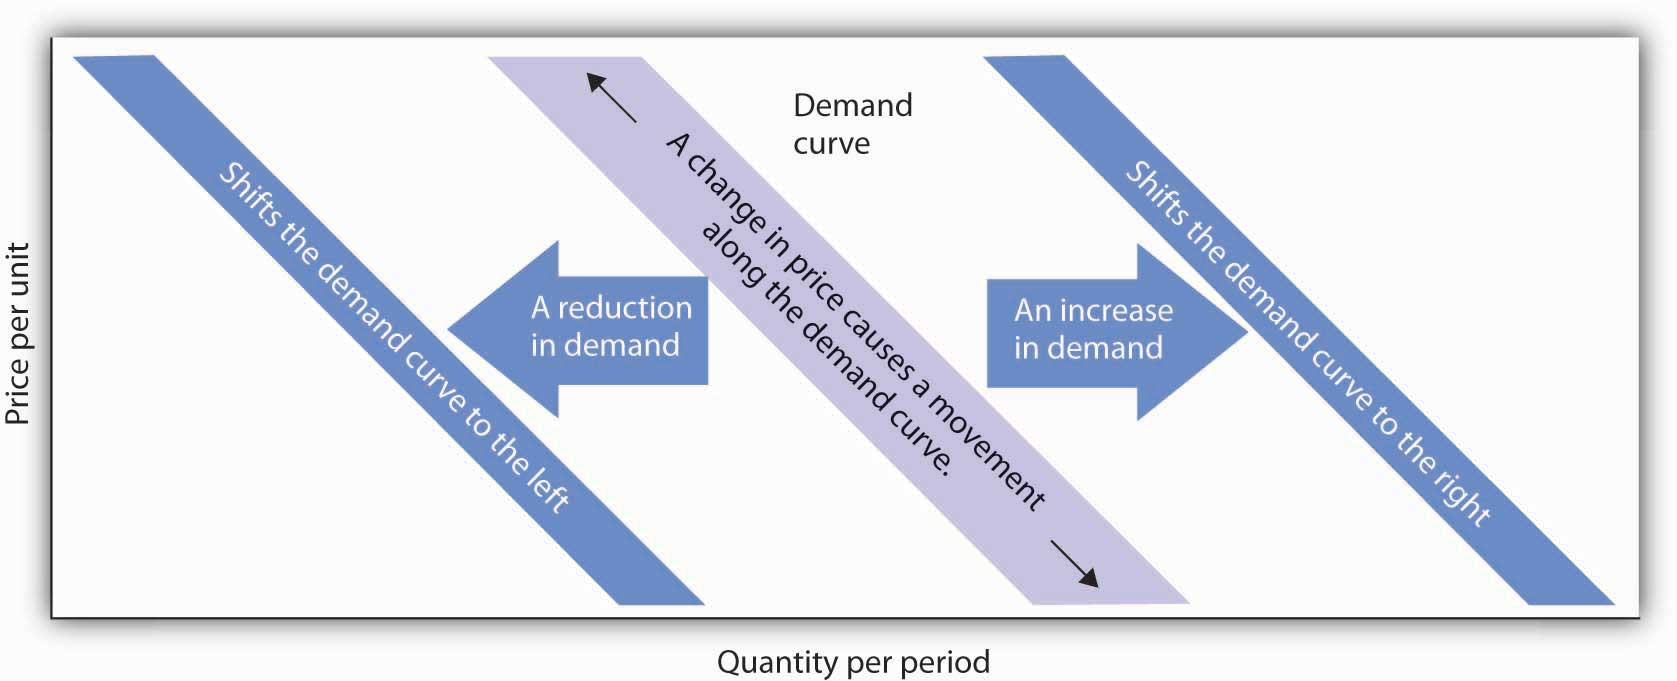 a shift in demand